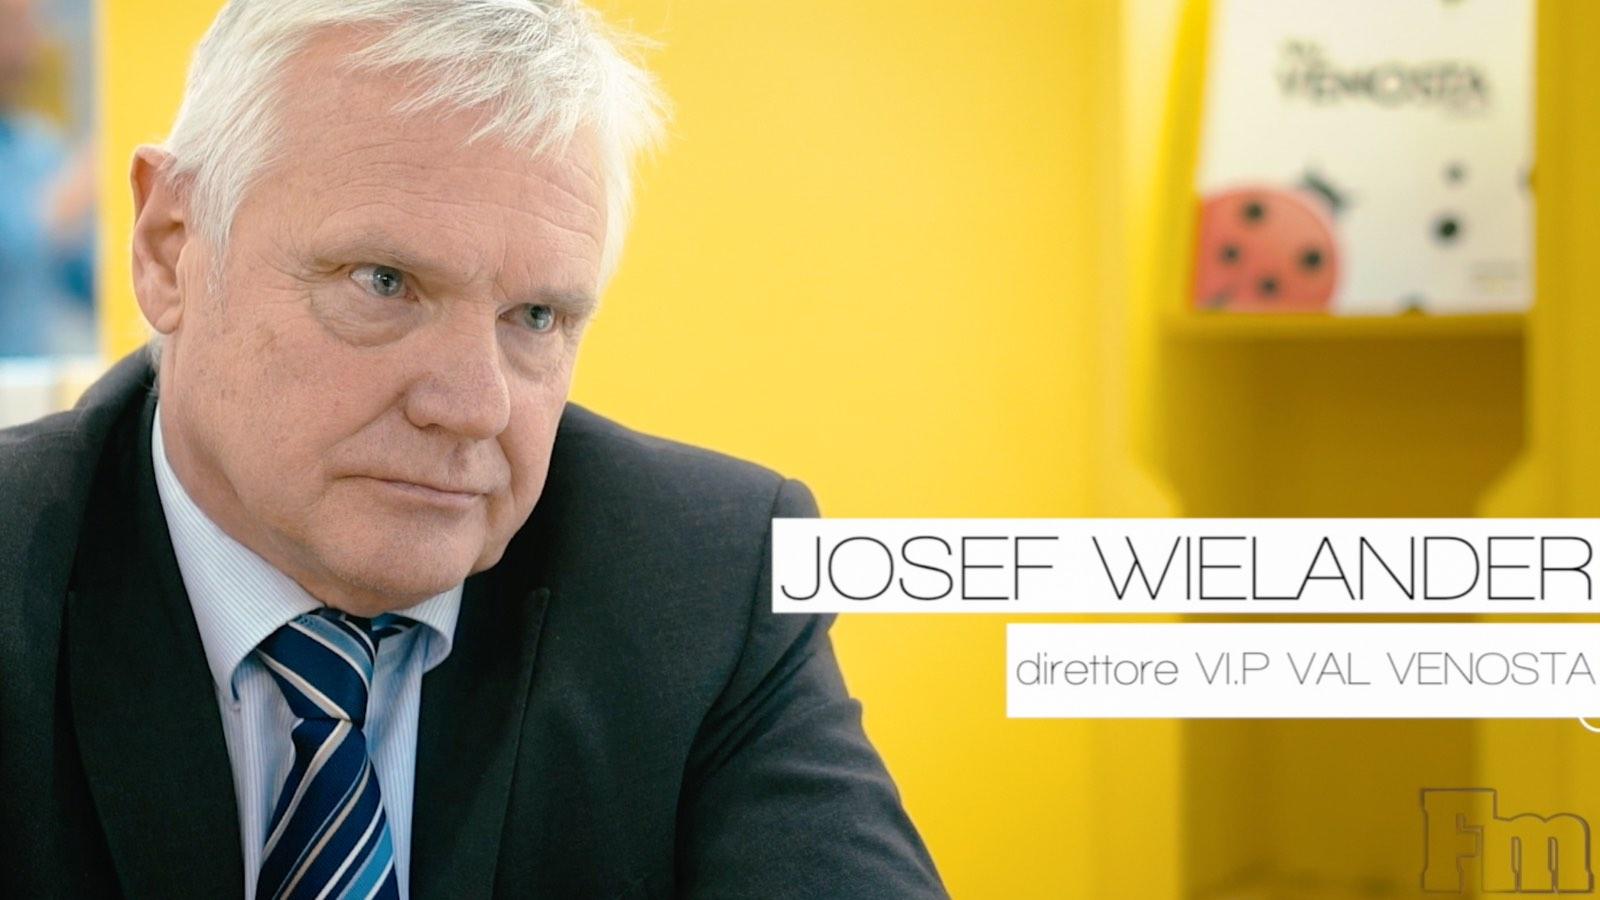 Josef-Wielander-VI.P-Val-Venosta-Interpoma-Fm-2018